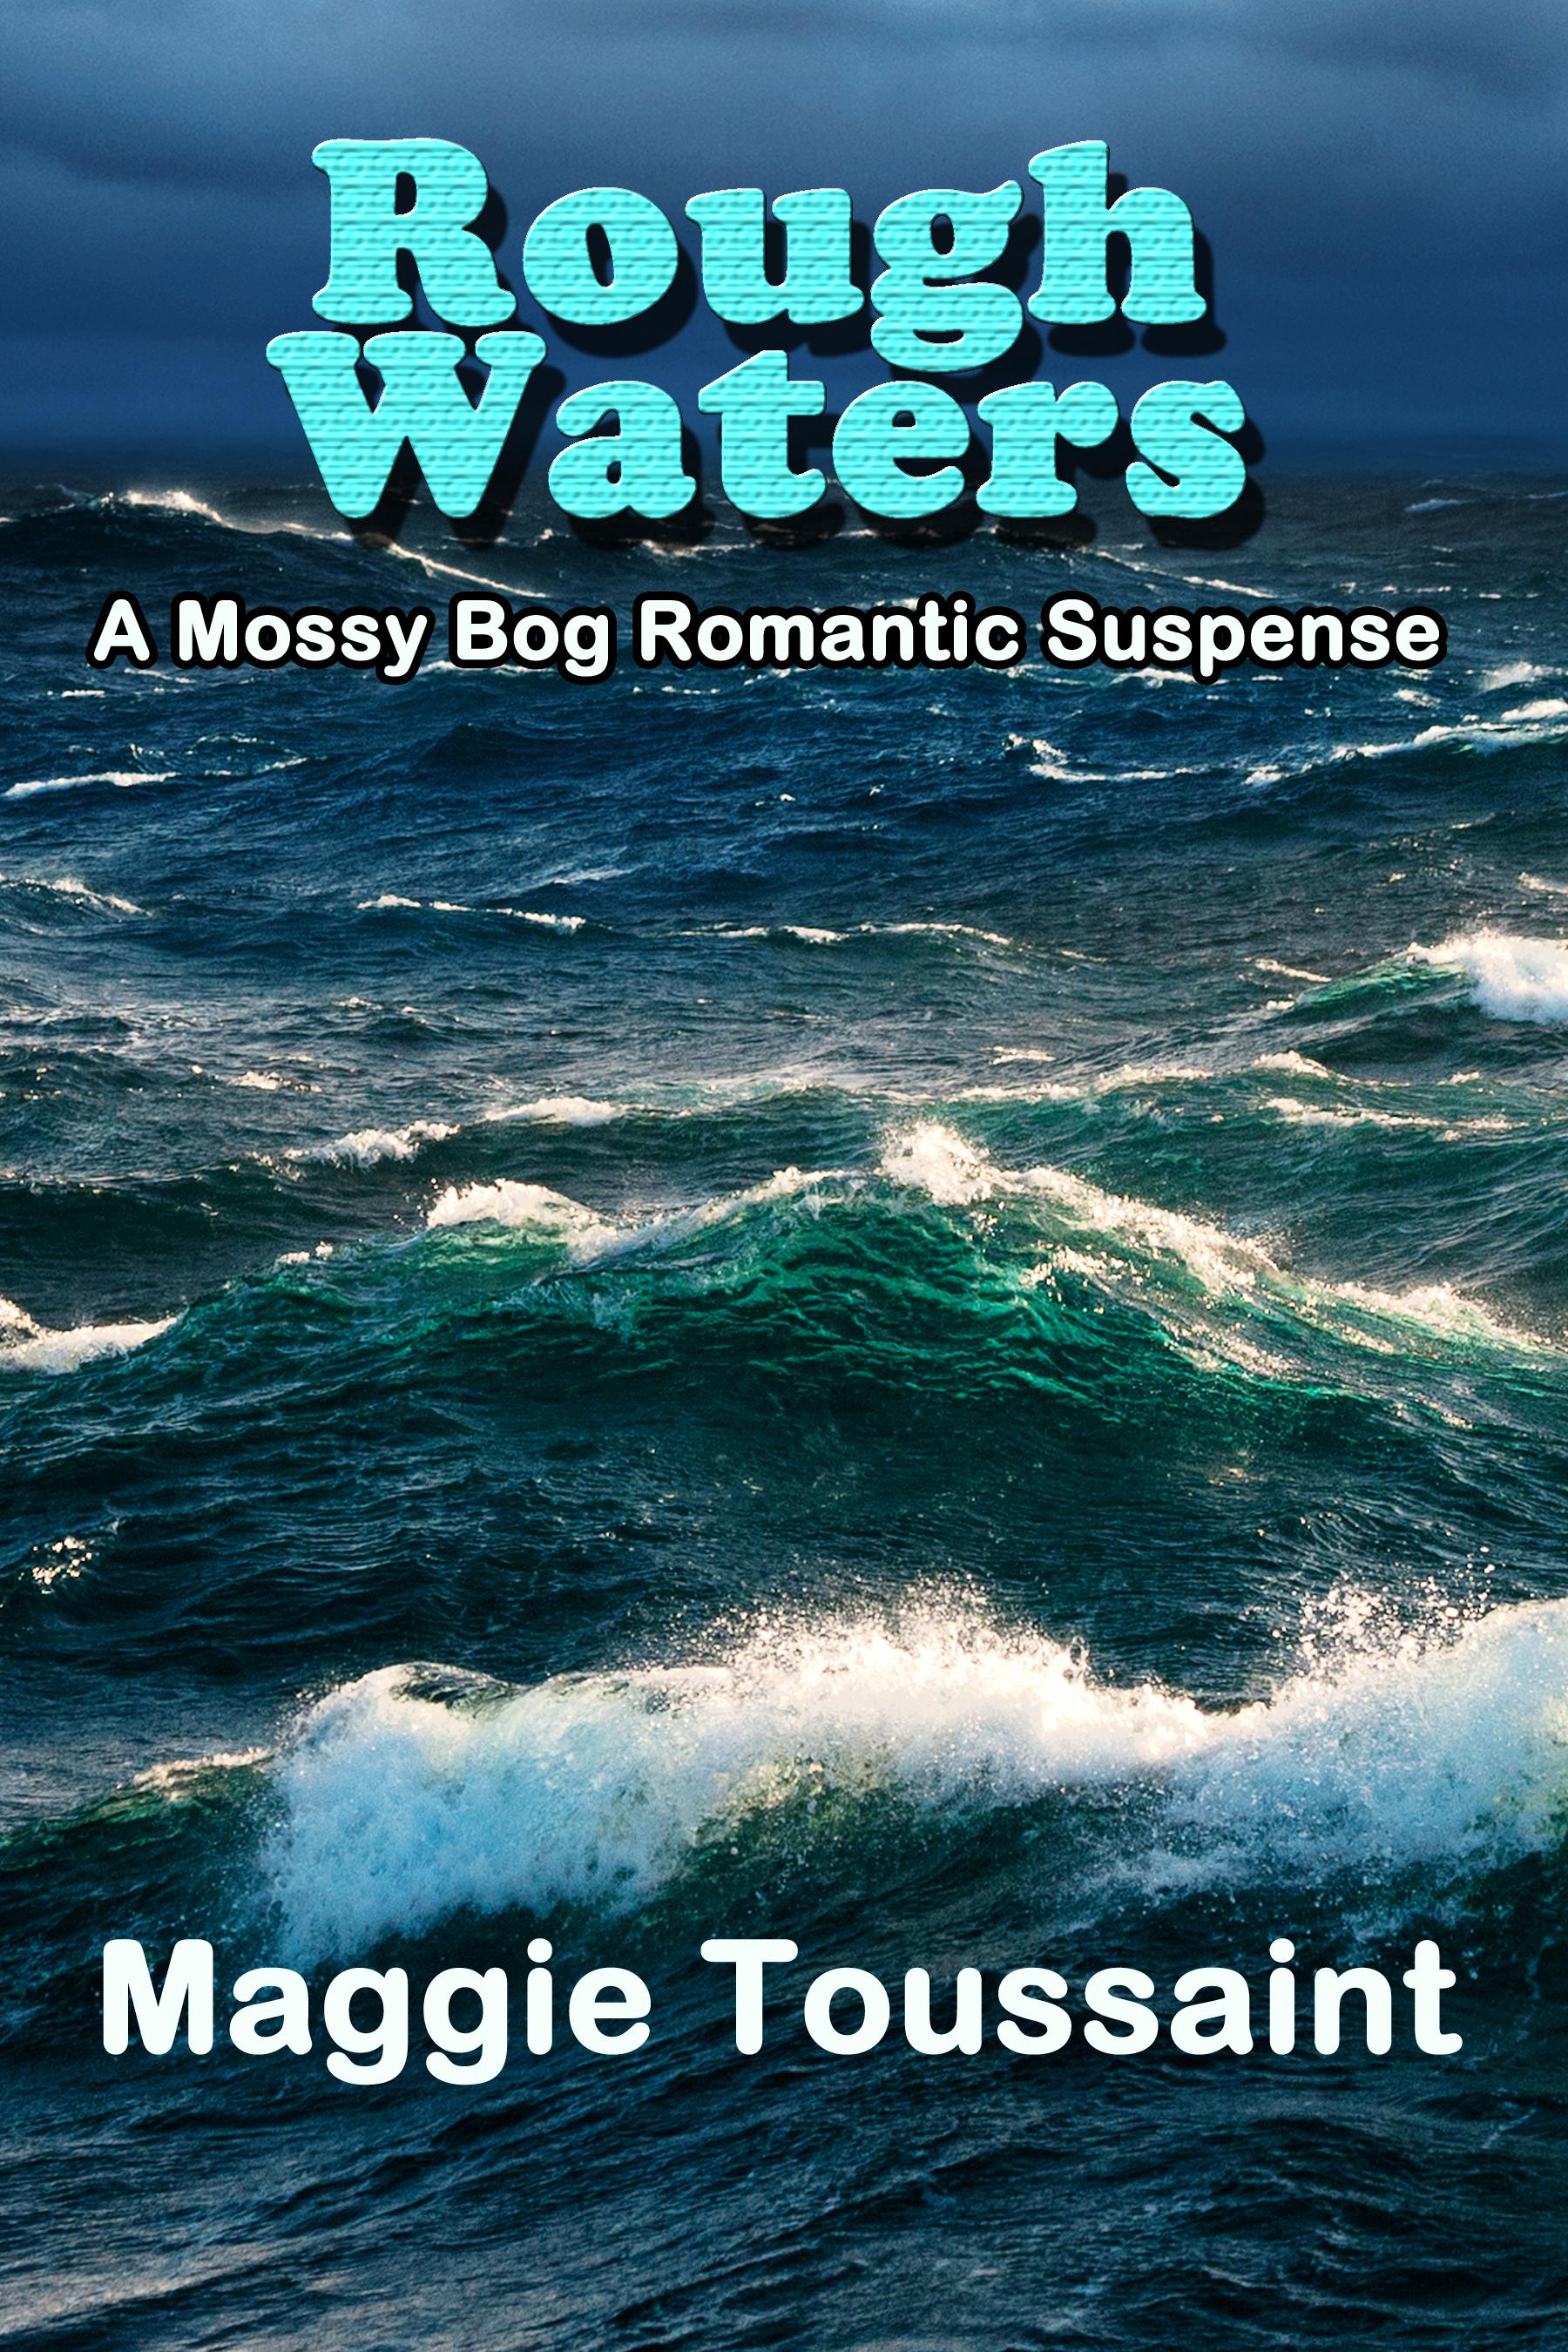 Good-Bye, Maggie: A Novel of Romantic Suspense